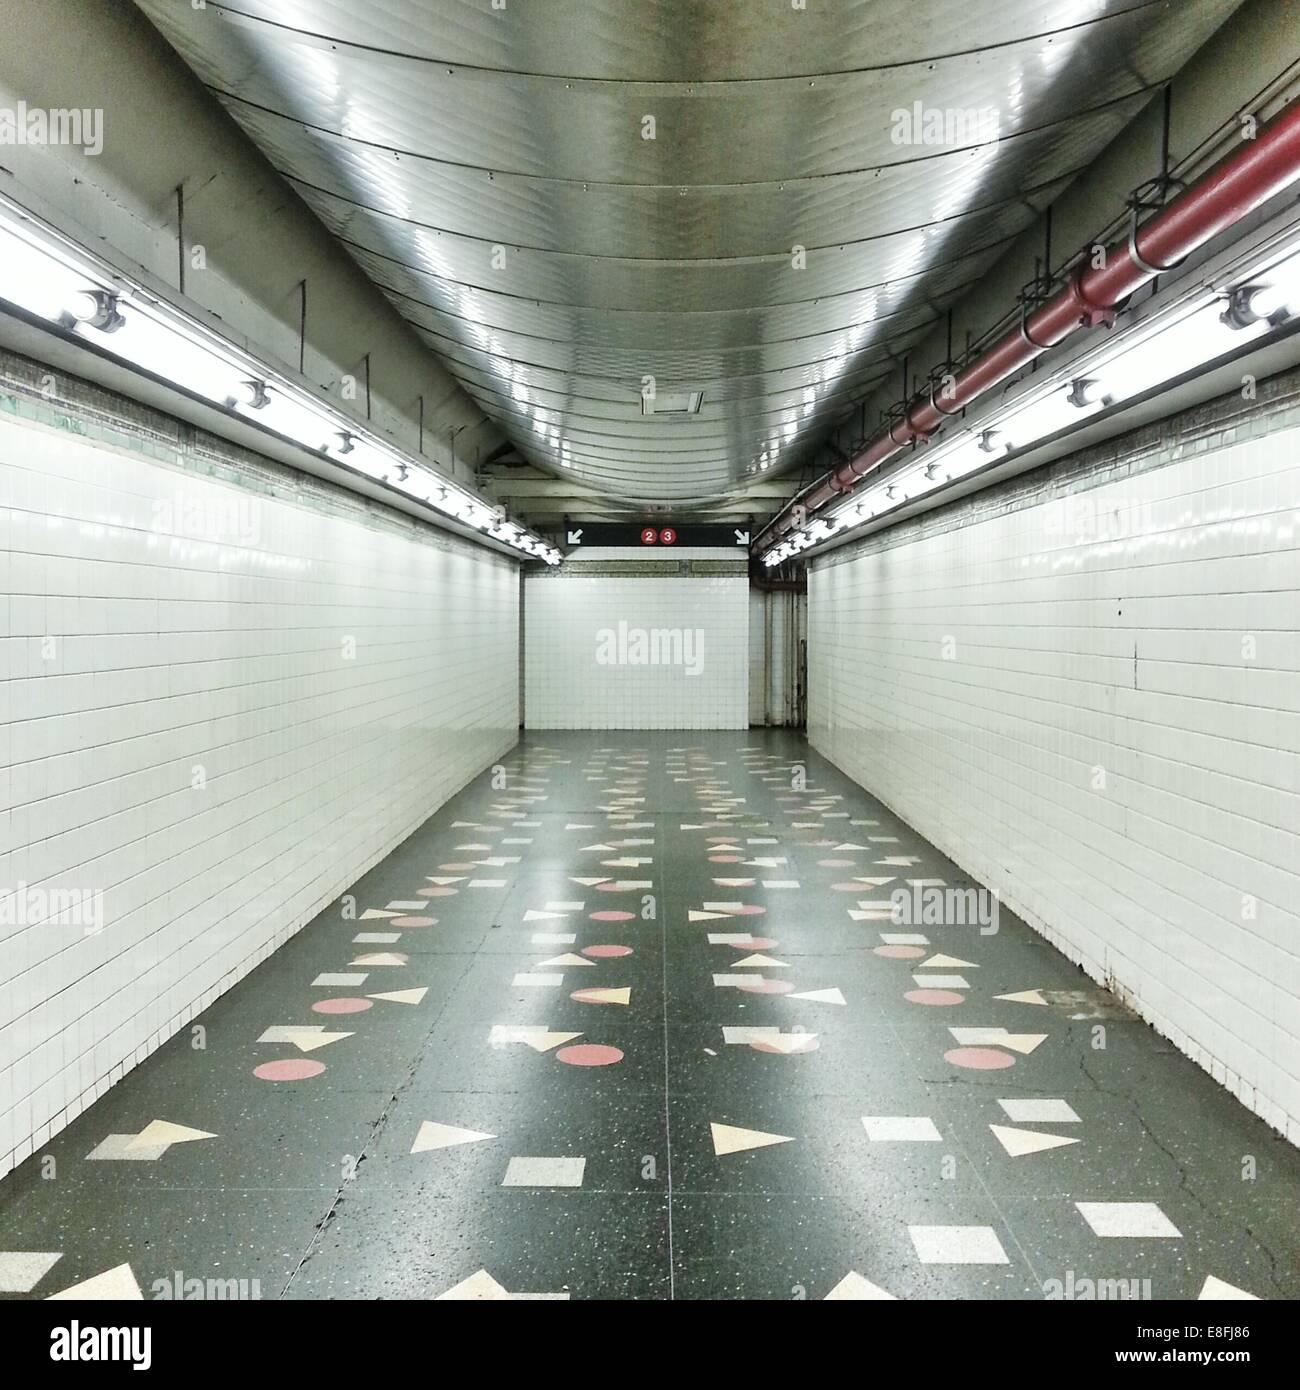 USA, New York State, New York City, Subway station corridor - Stock Image